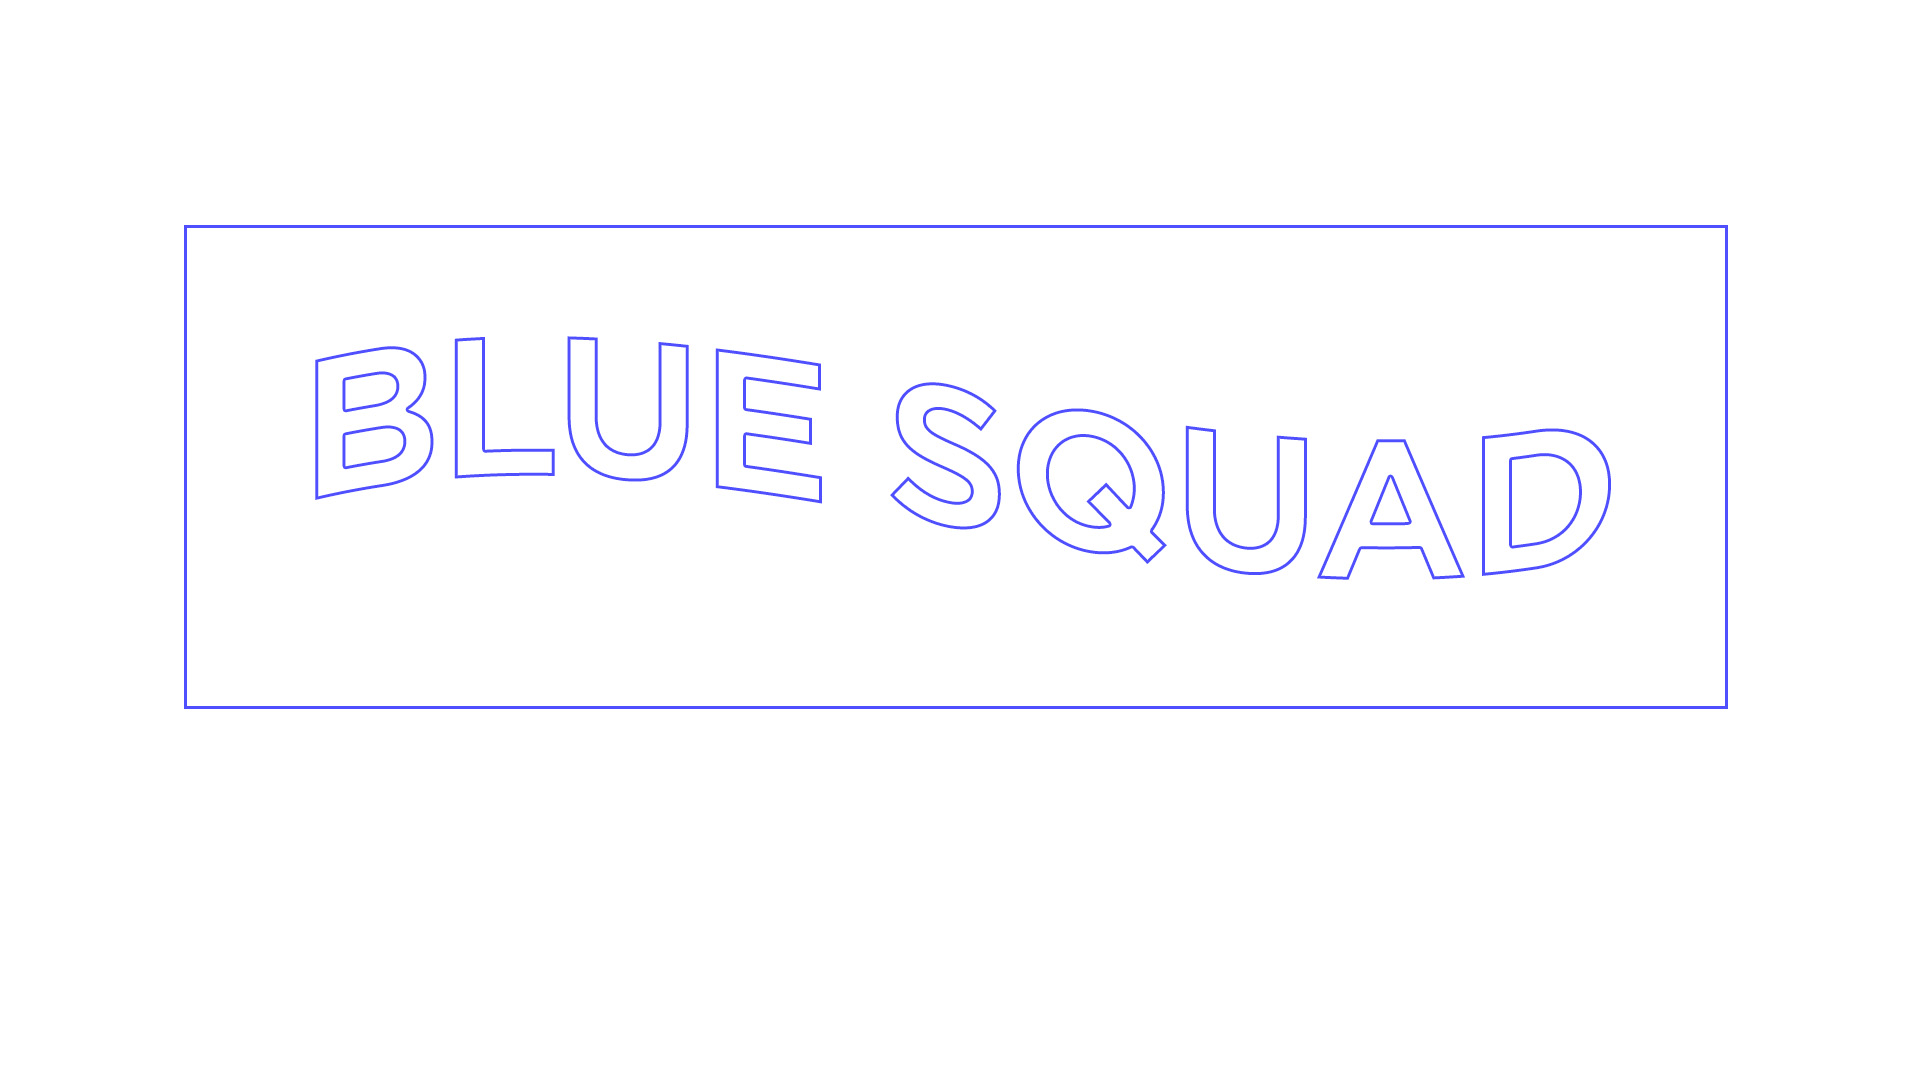 bluesquad header.jpg